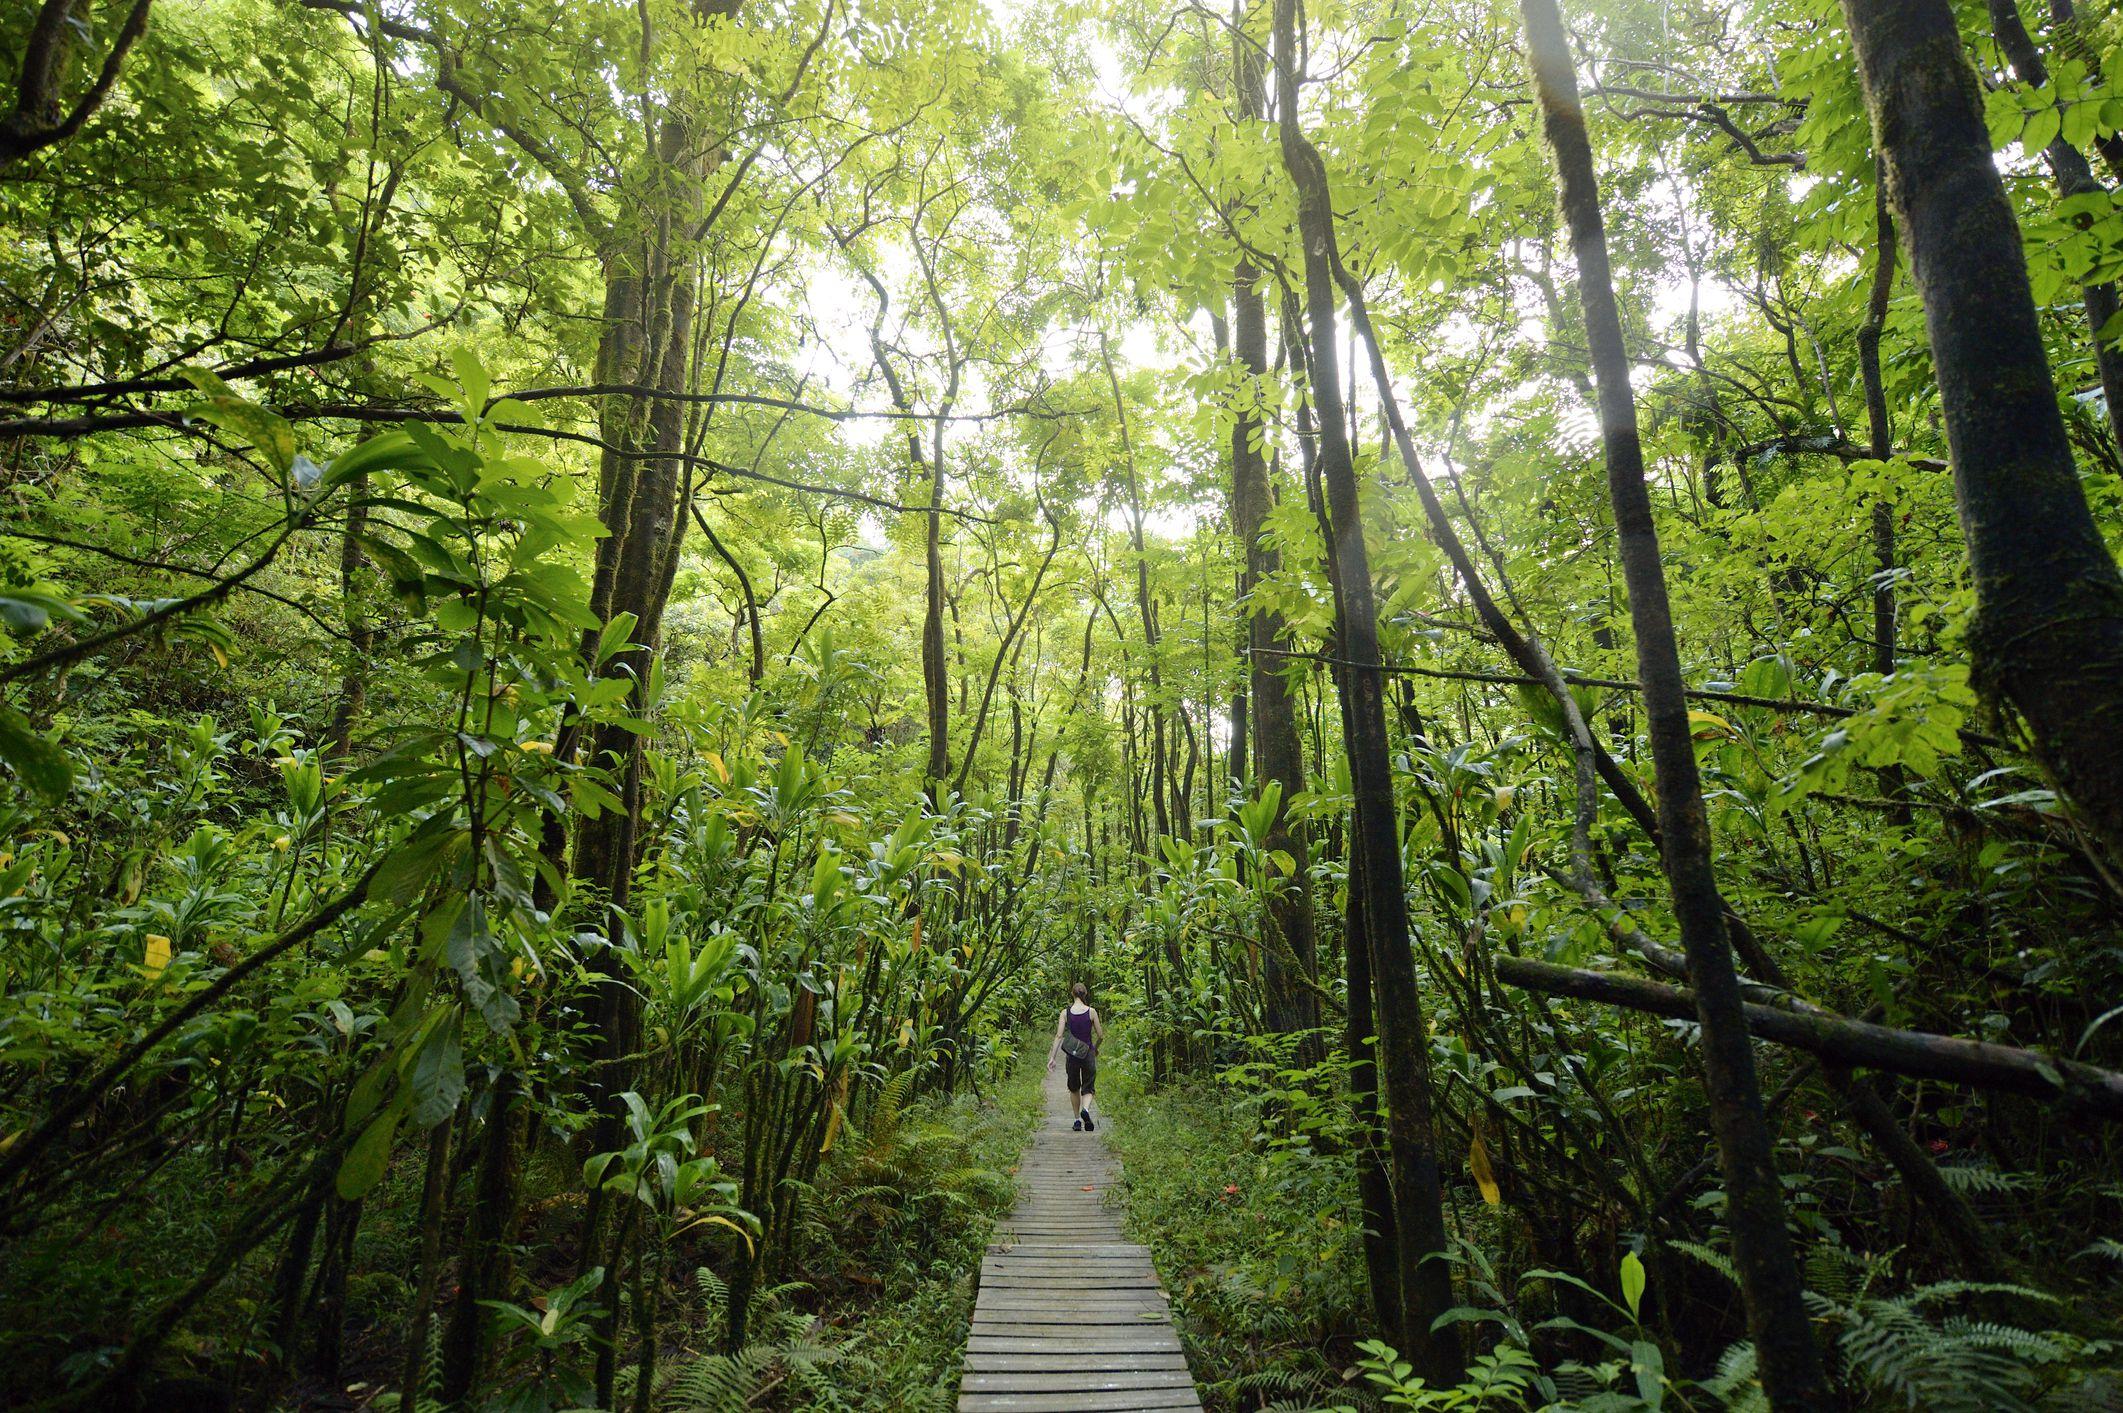 A Complete Guide to Hiking Maui's Pipiwai Trail